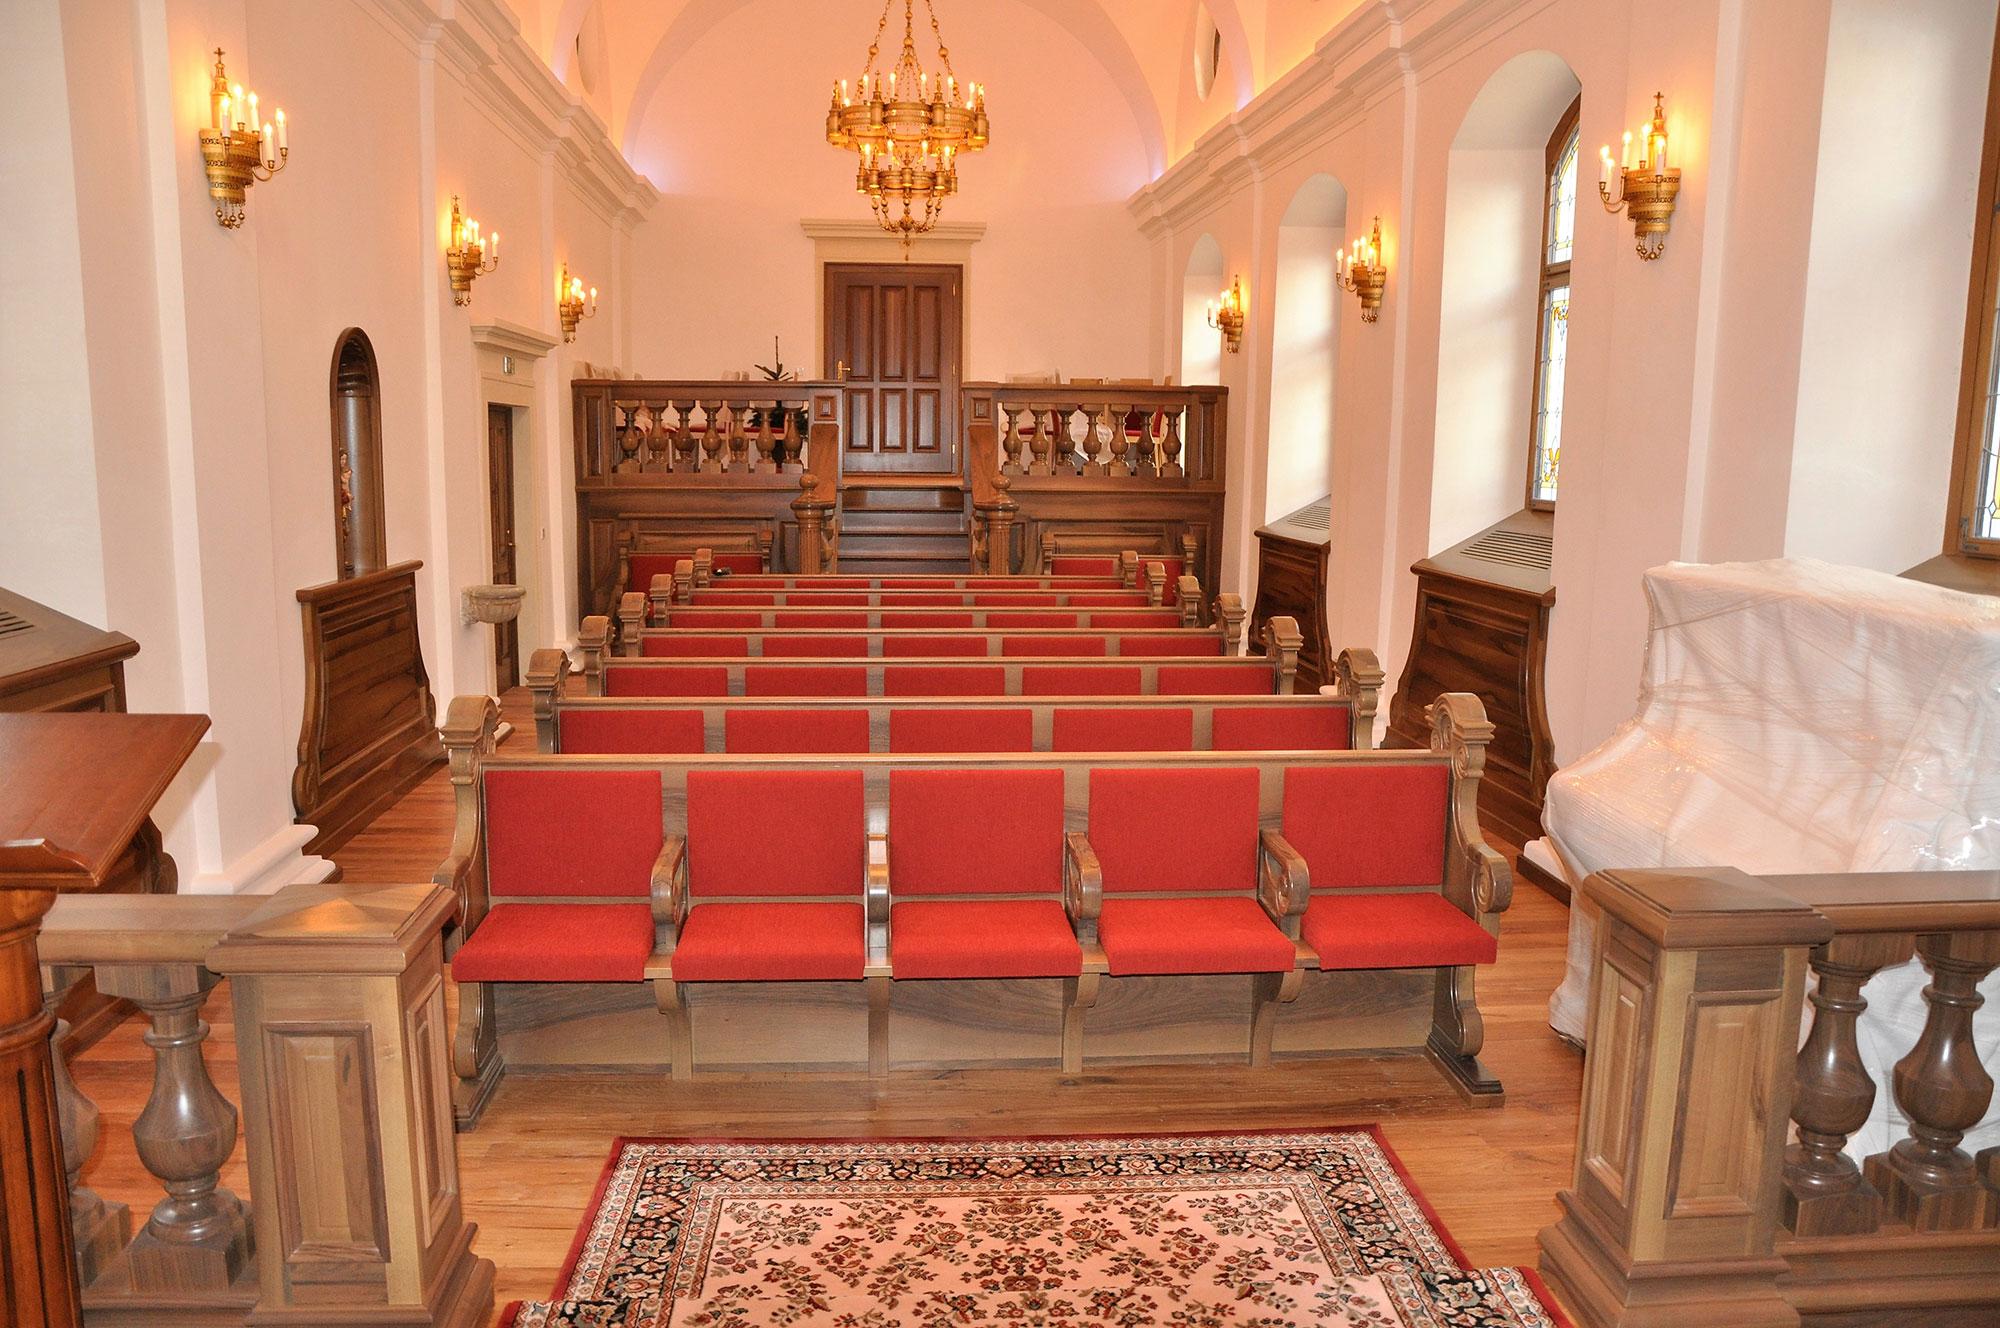 Kirchenmobiliar - Holzbänke für Kirche